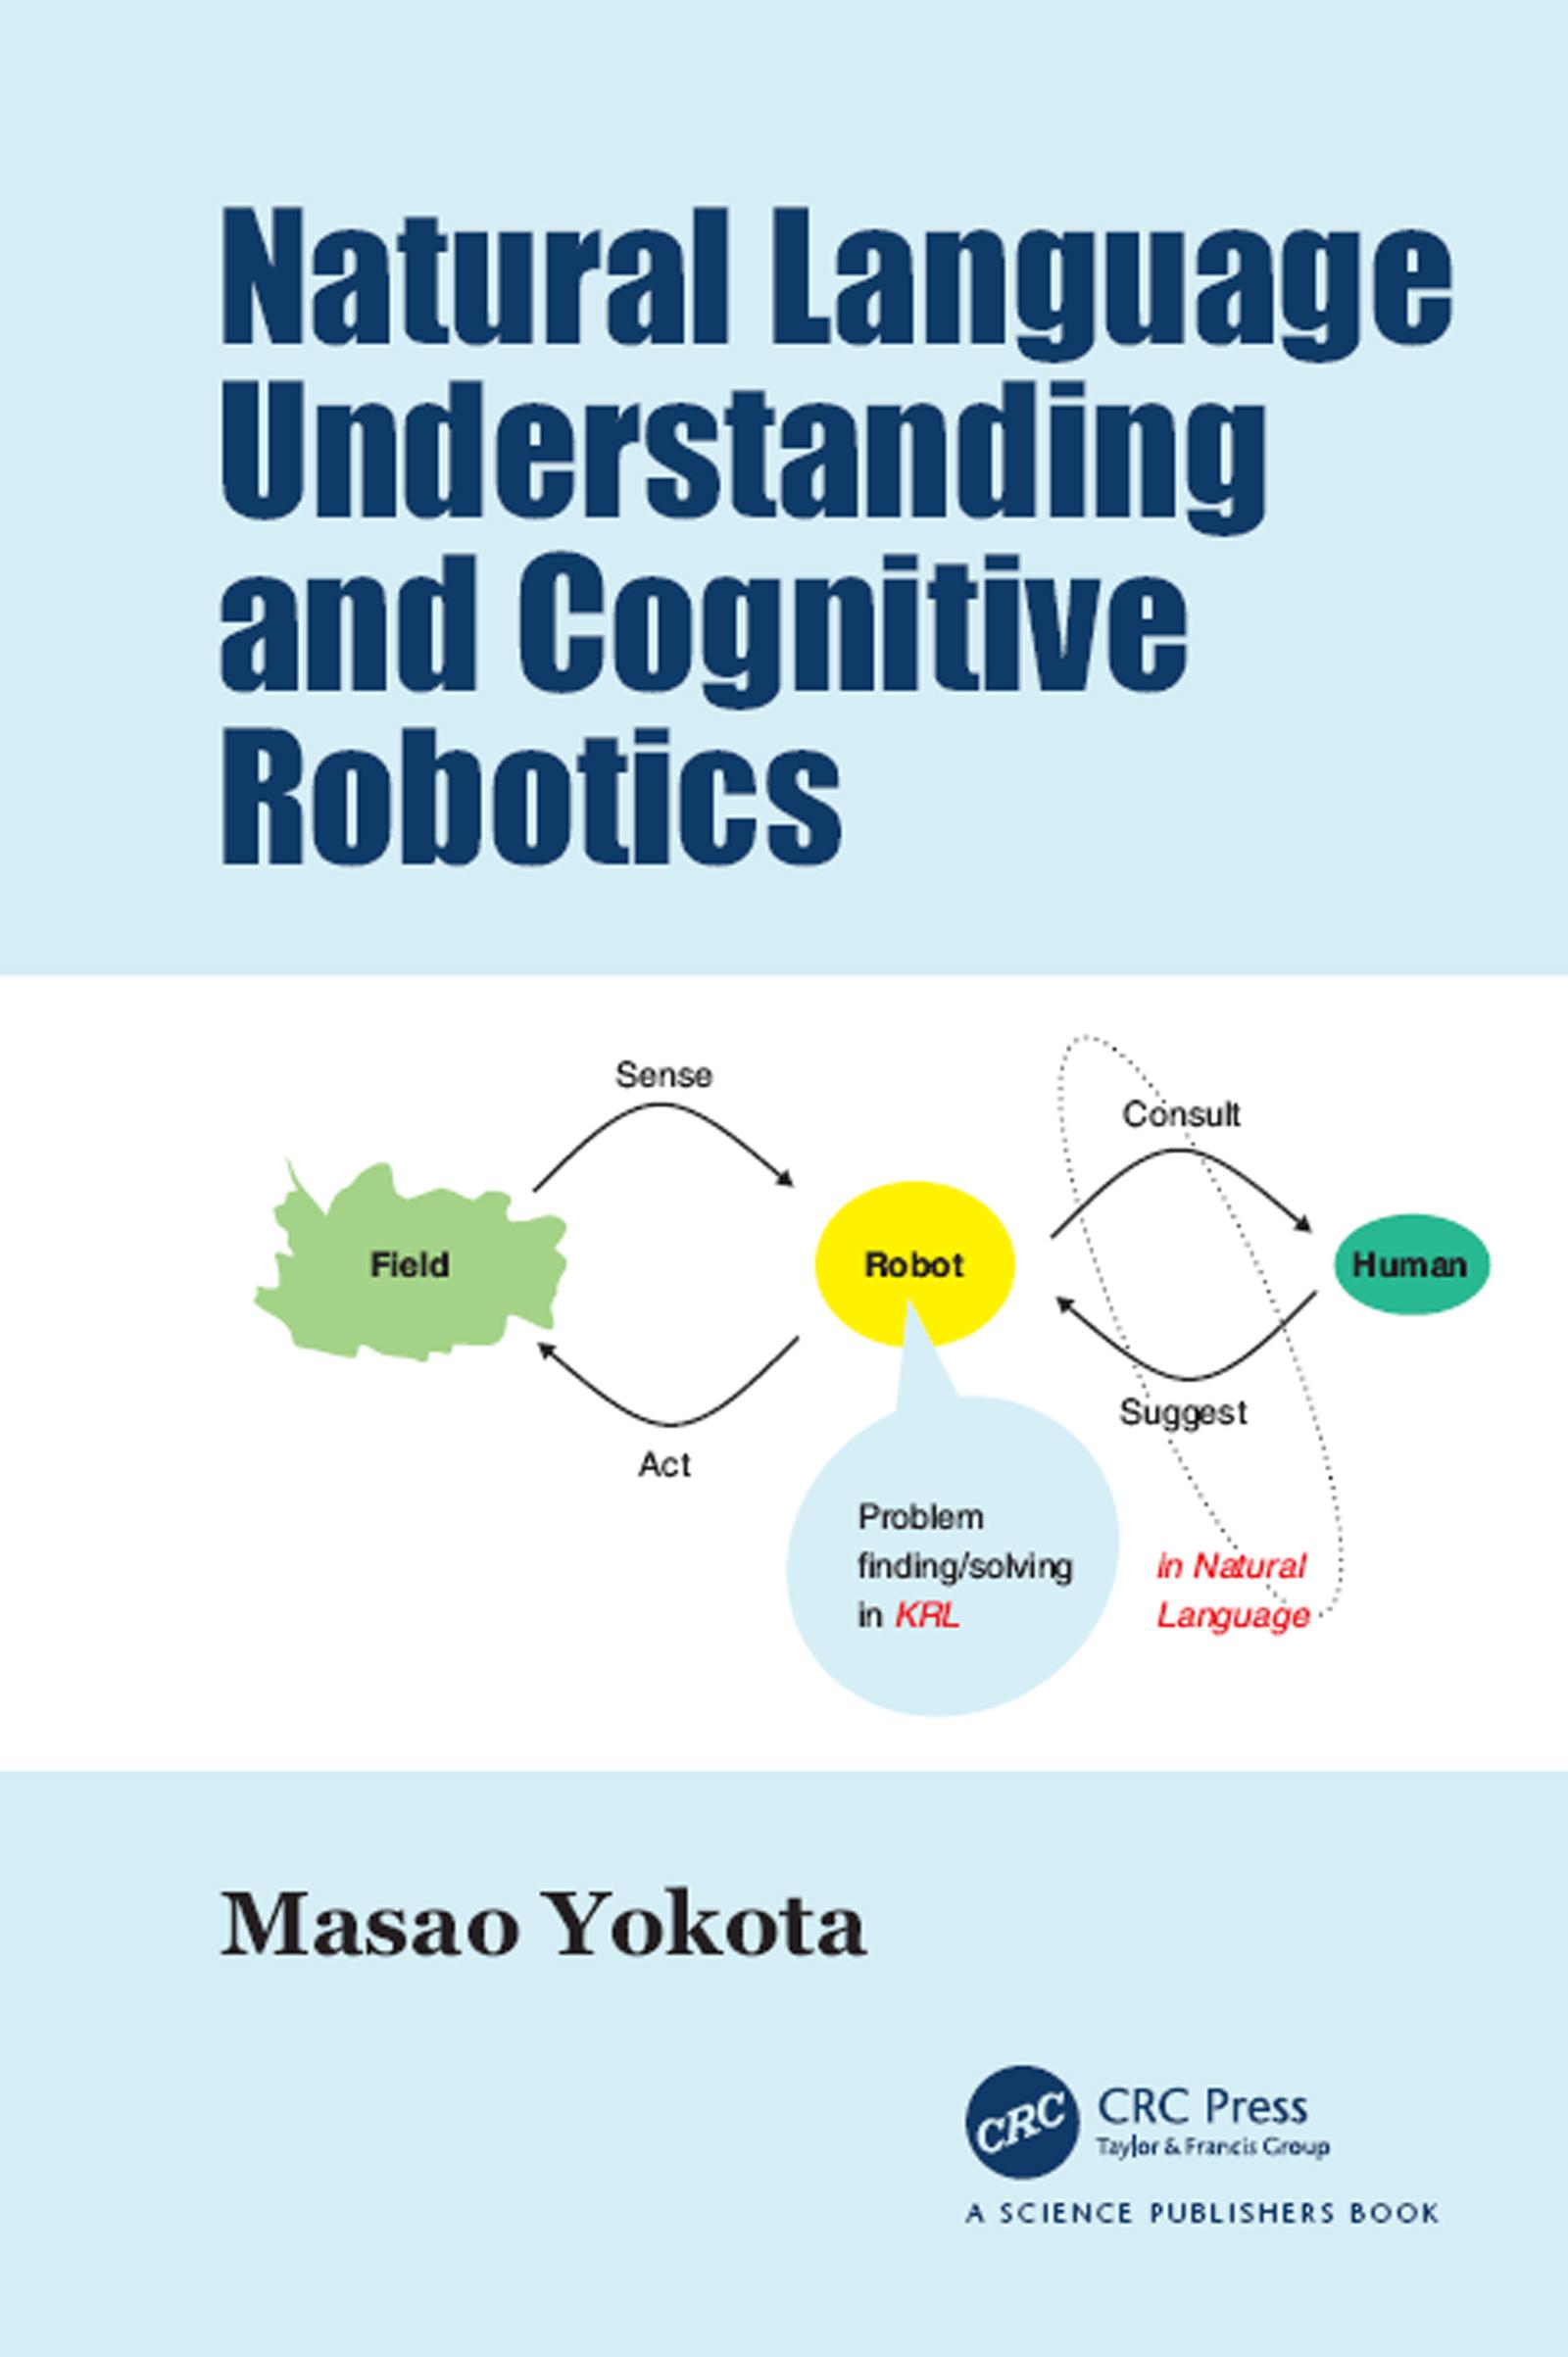 Computational Model of Japanese for Natural Language Understanding